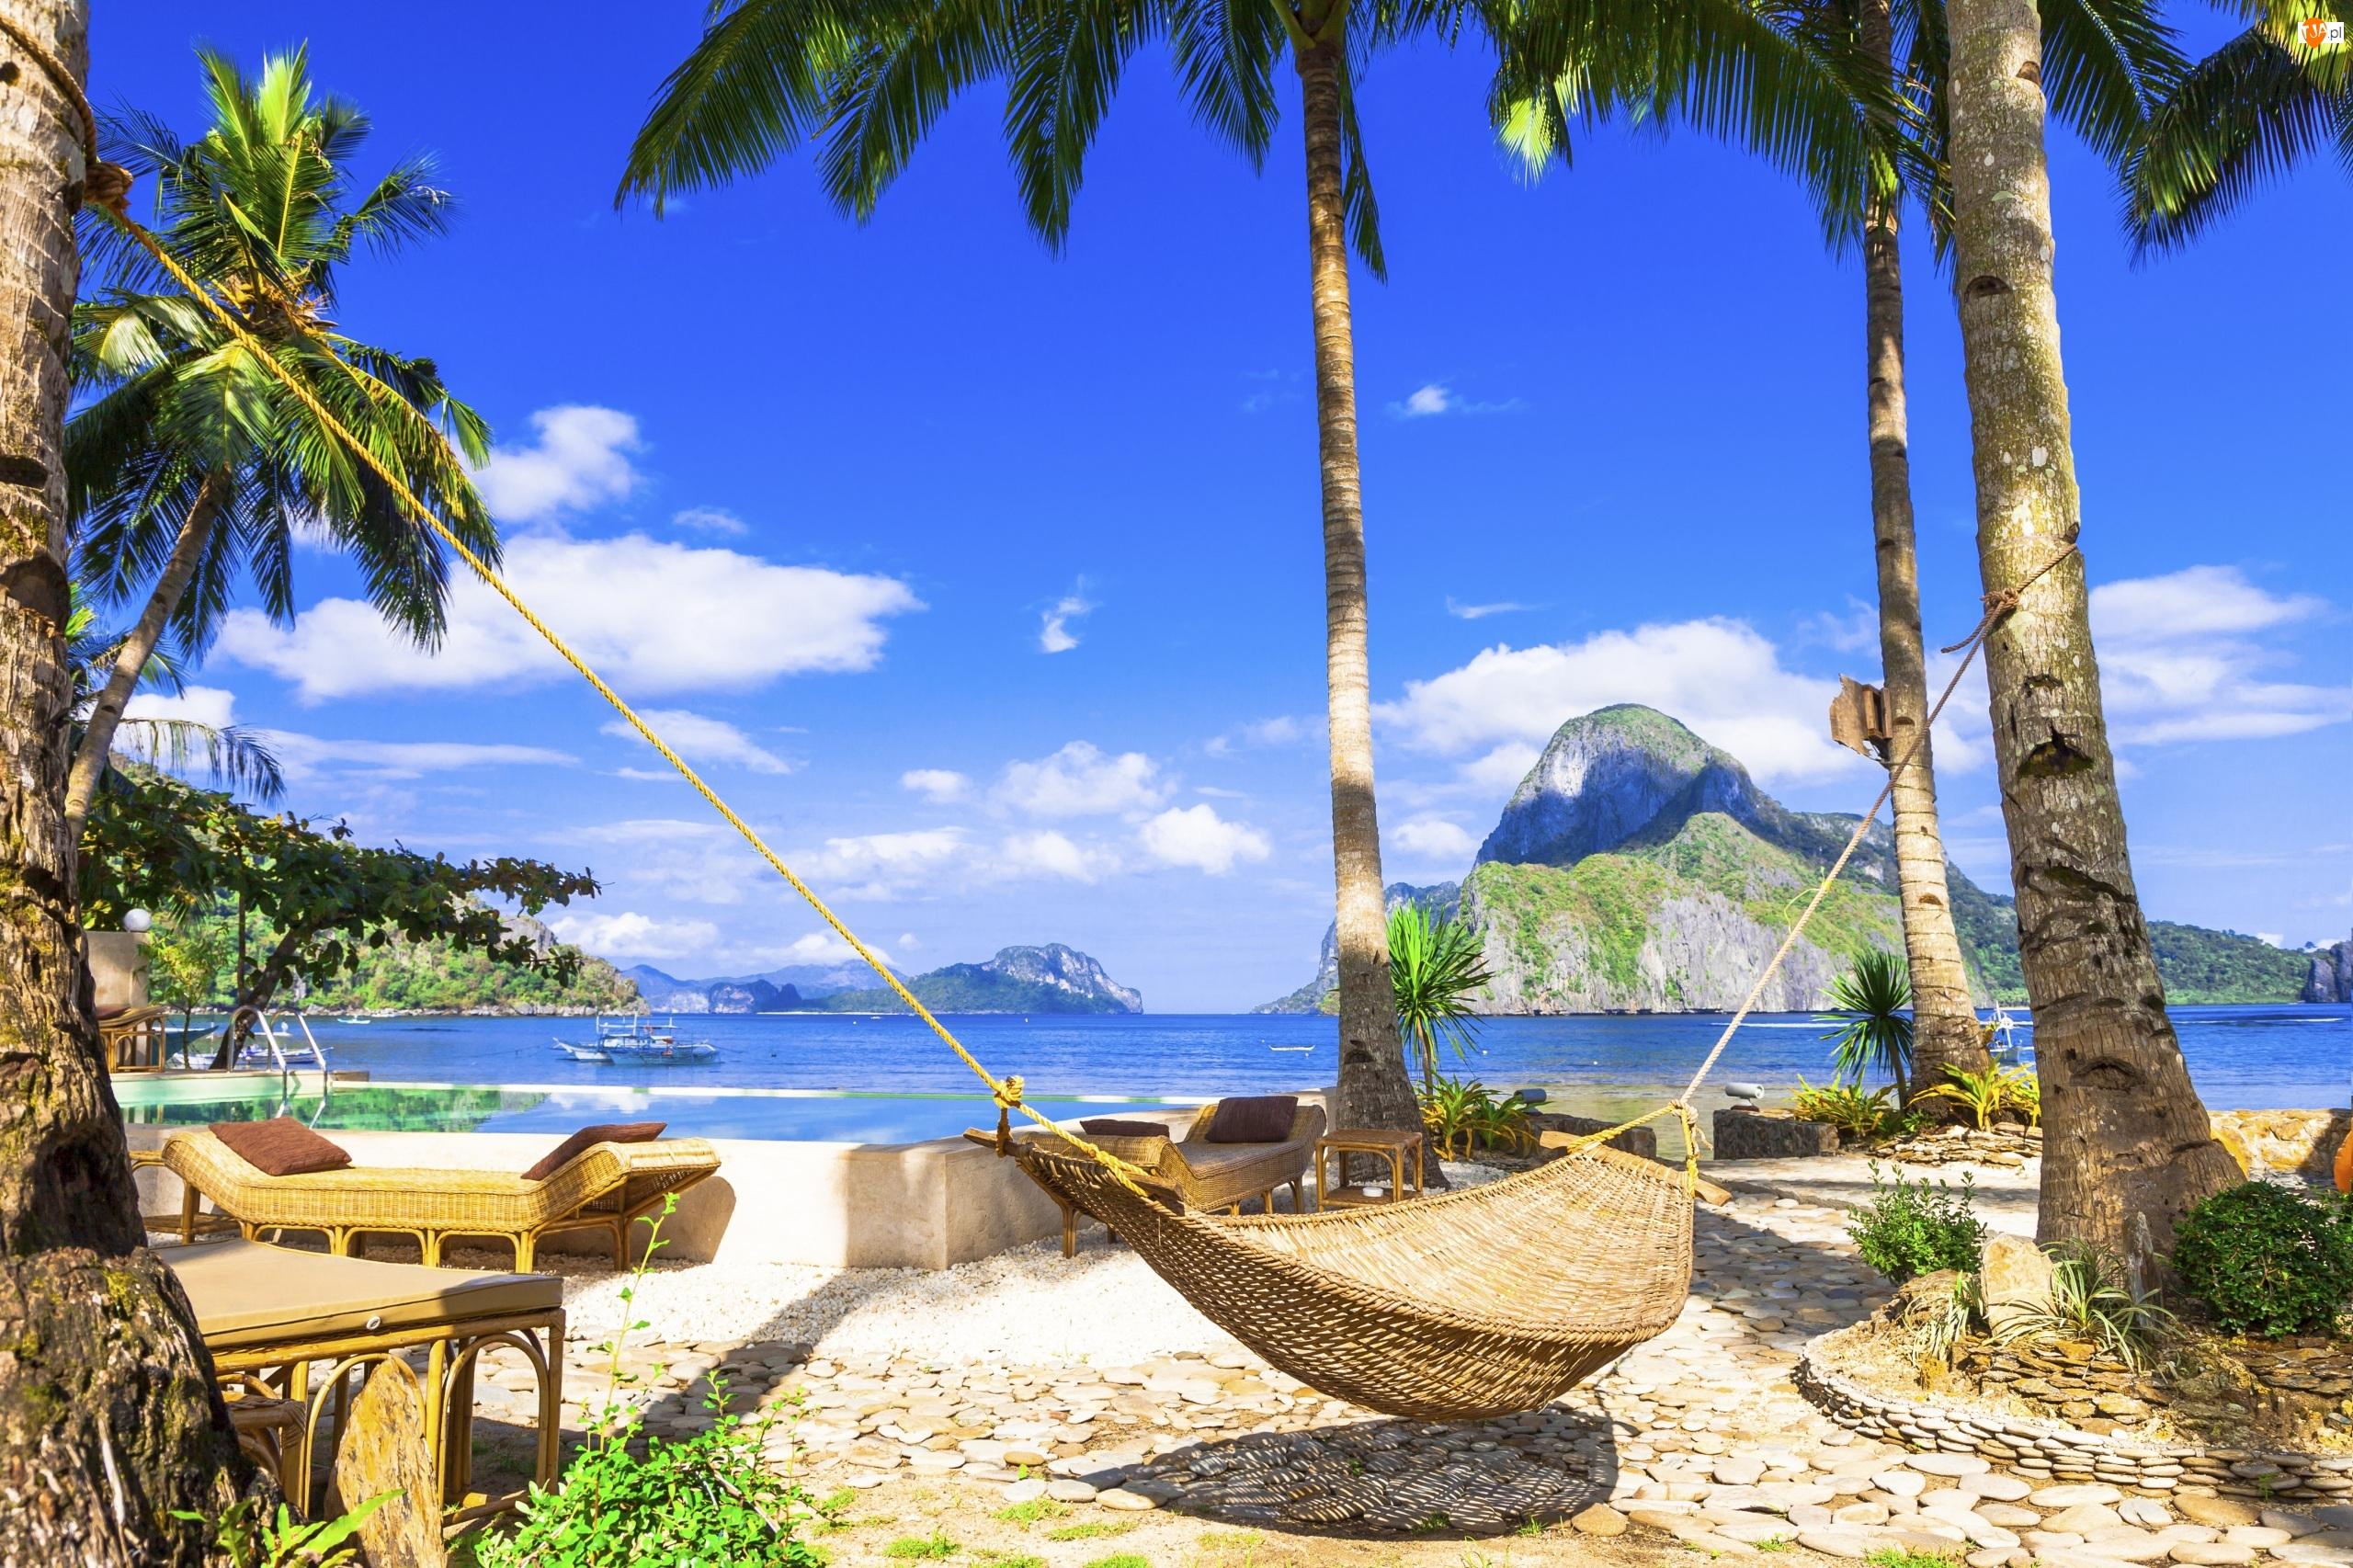 Hamak, Morze, Wyspa Boracay, Filipiny, Palmy, Lato, Sofy